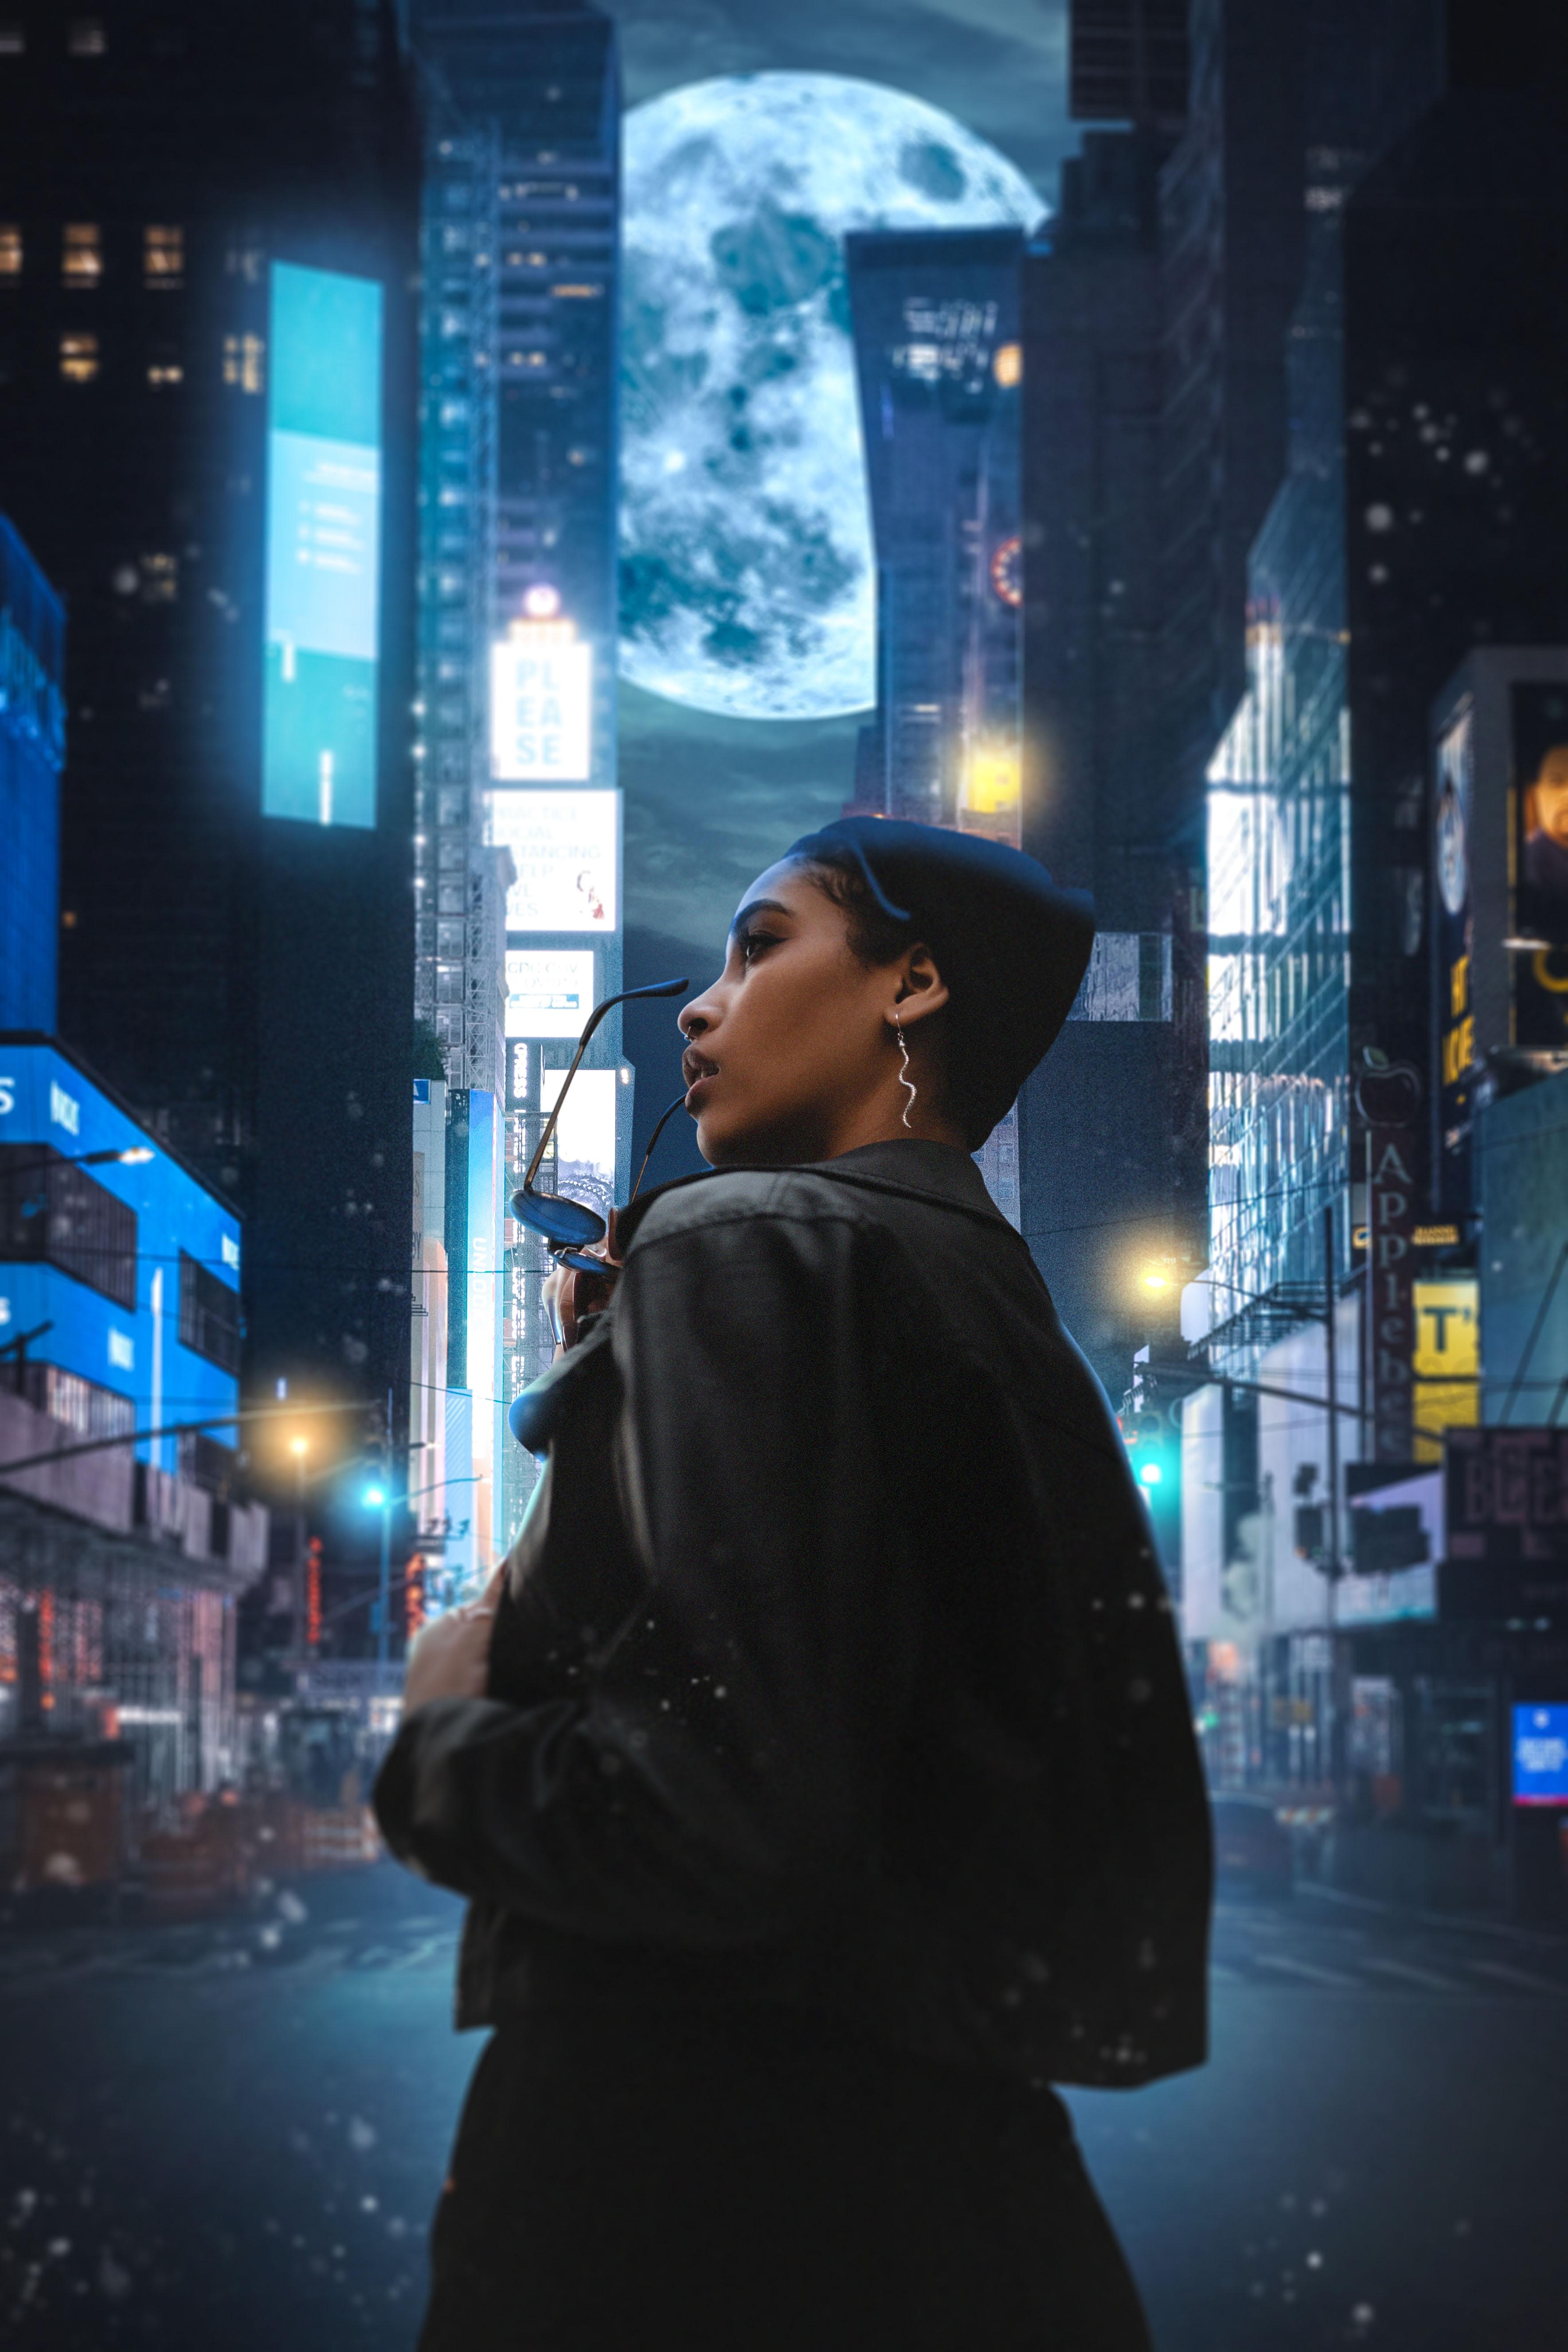 Women City Moon Portrait Display 3537x5305